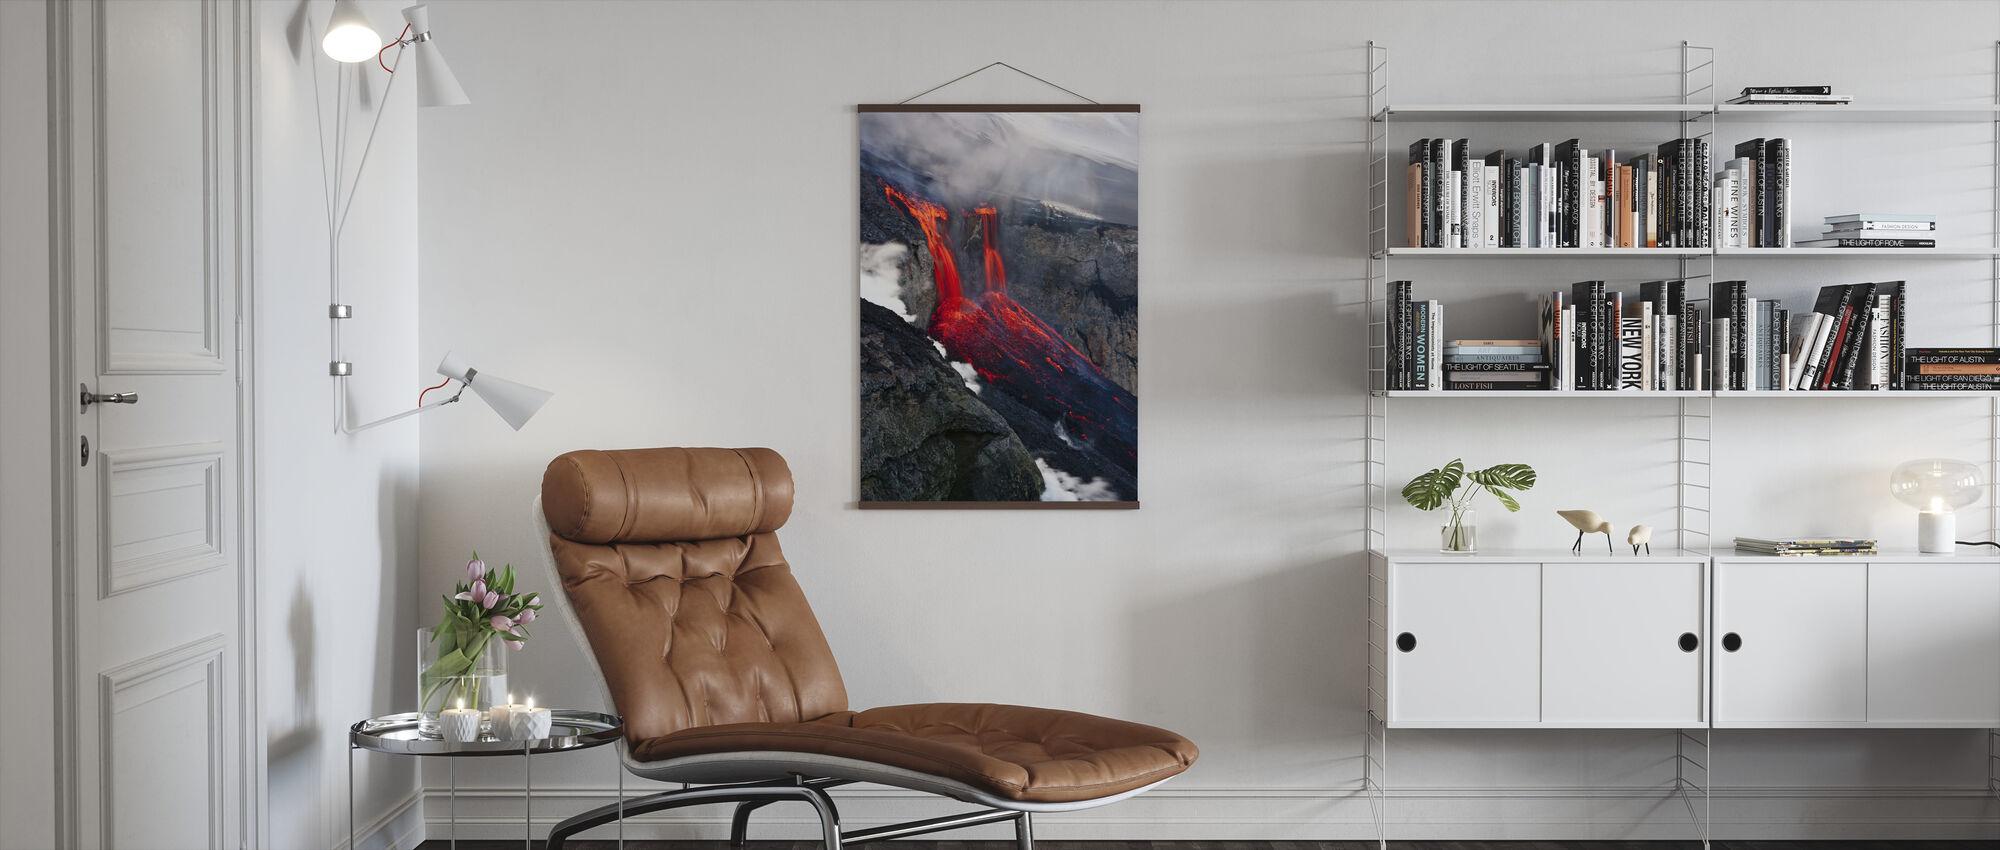 Liquid Fire - Poster - Living Room